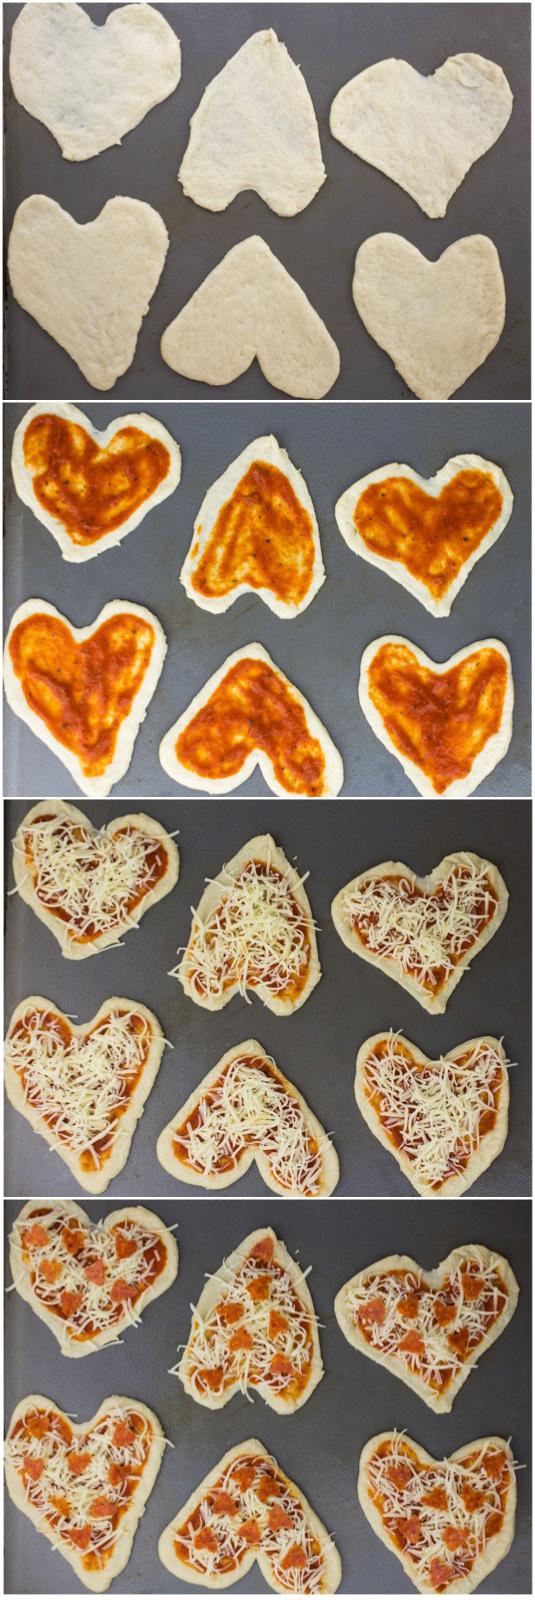 Heart Pizza Steps